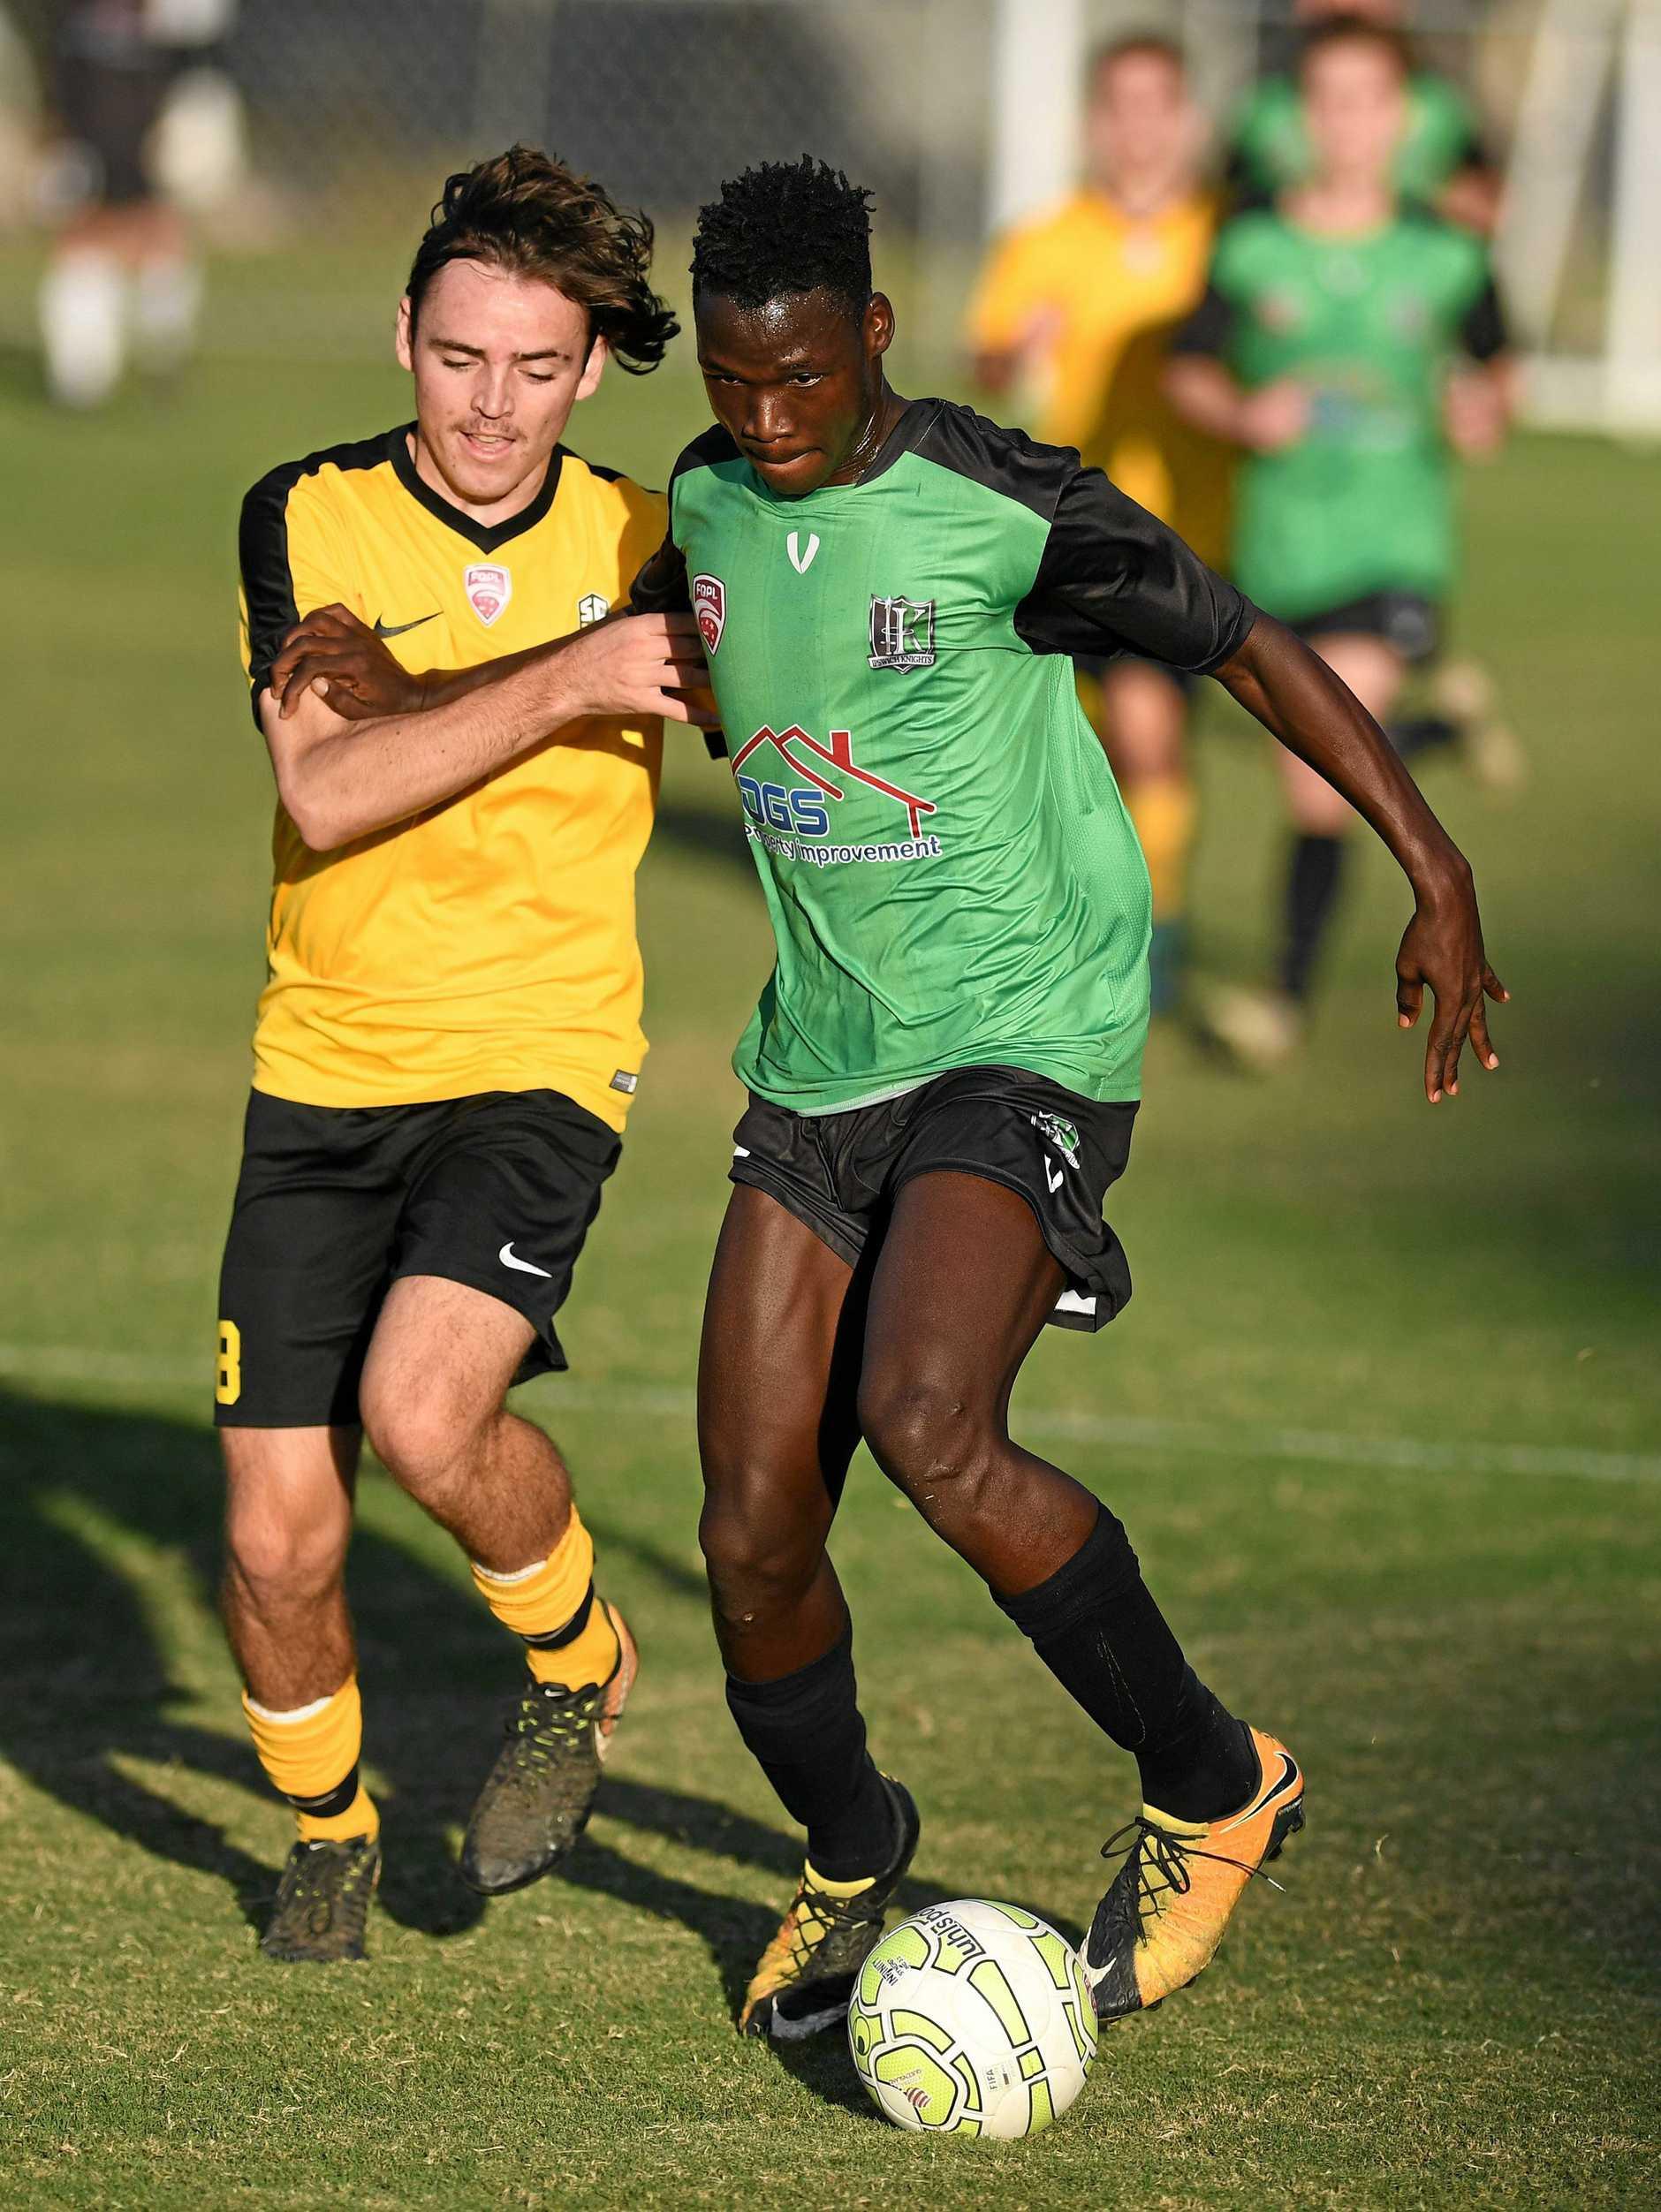 QPL u20's soccer match played between the Ipswich Knights and the Sunshine Coast at Bundamba on Saturday. Lucky Joe.